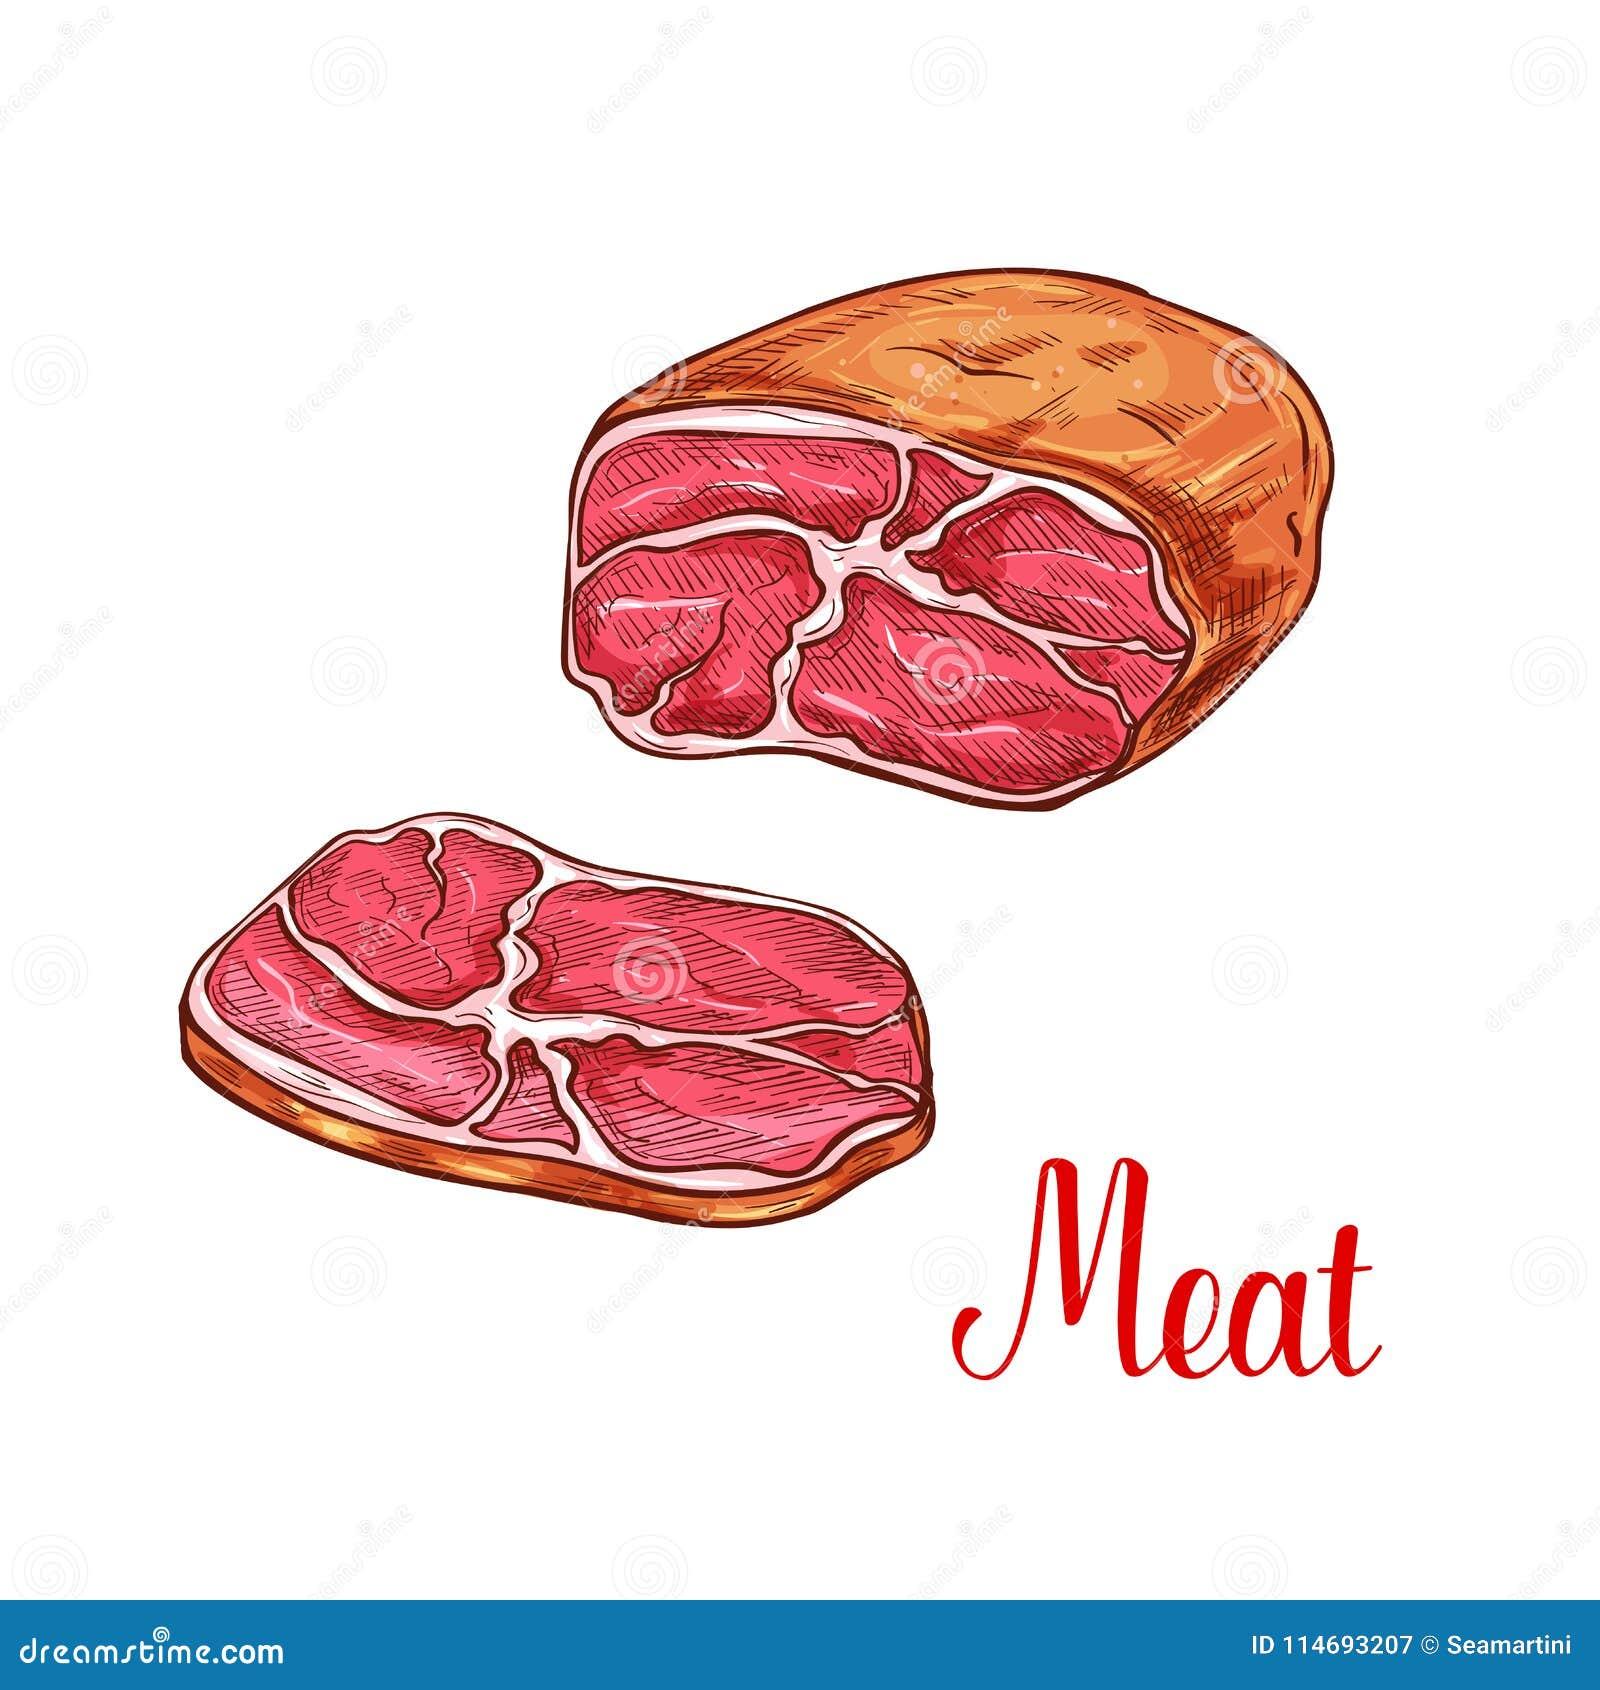 Croquis de poitrine de viande avec la tranche de boeuf ou de porc